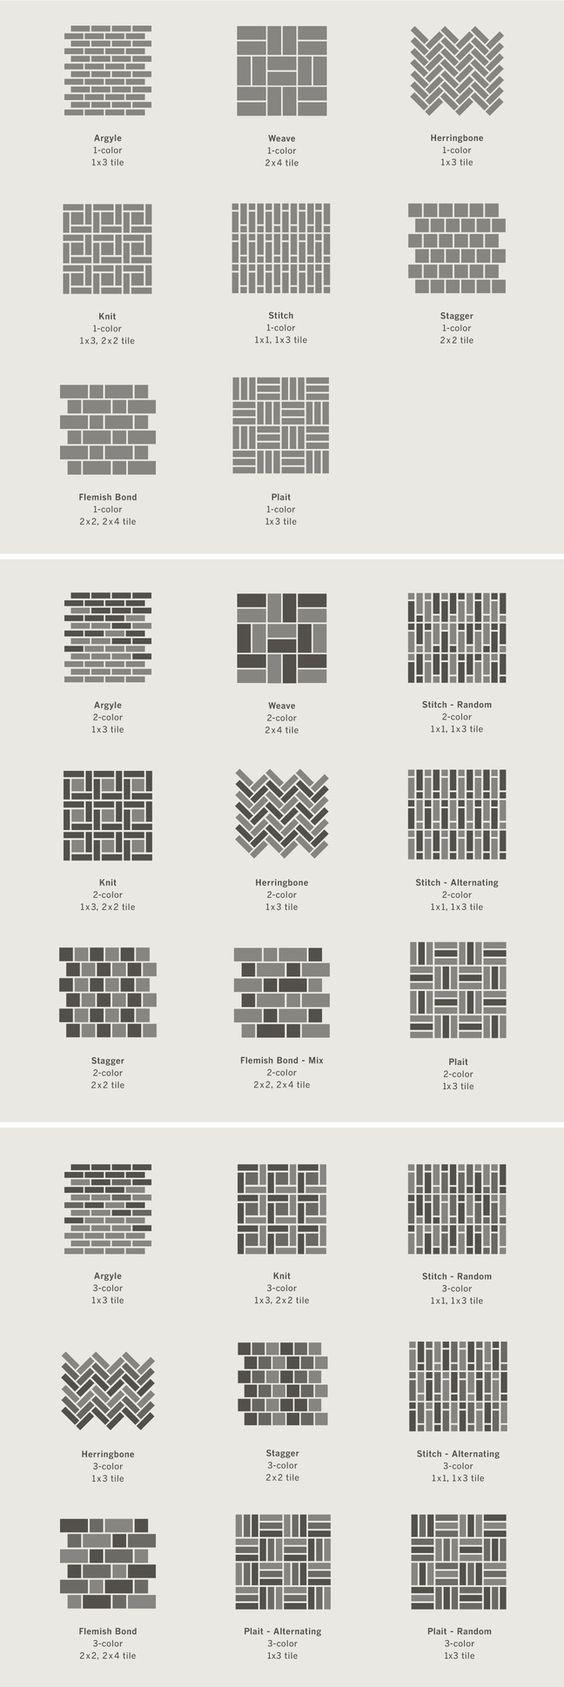 Supernatural Style | https://pinterest.com/SnatualStyle/  Tapestry - Heath Ceramics